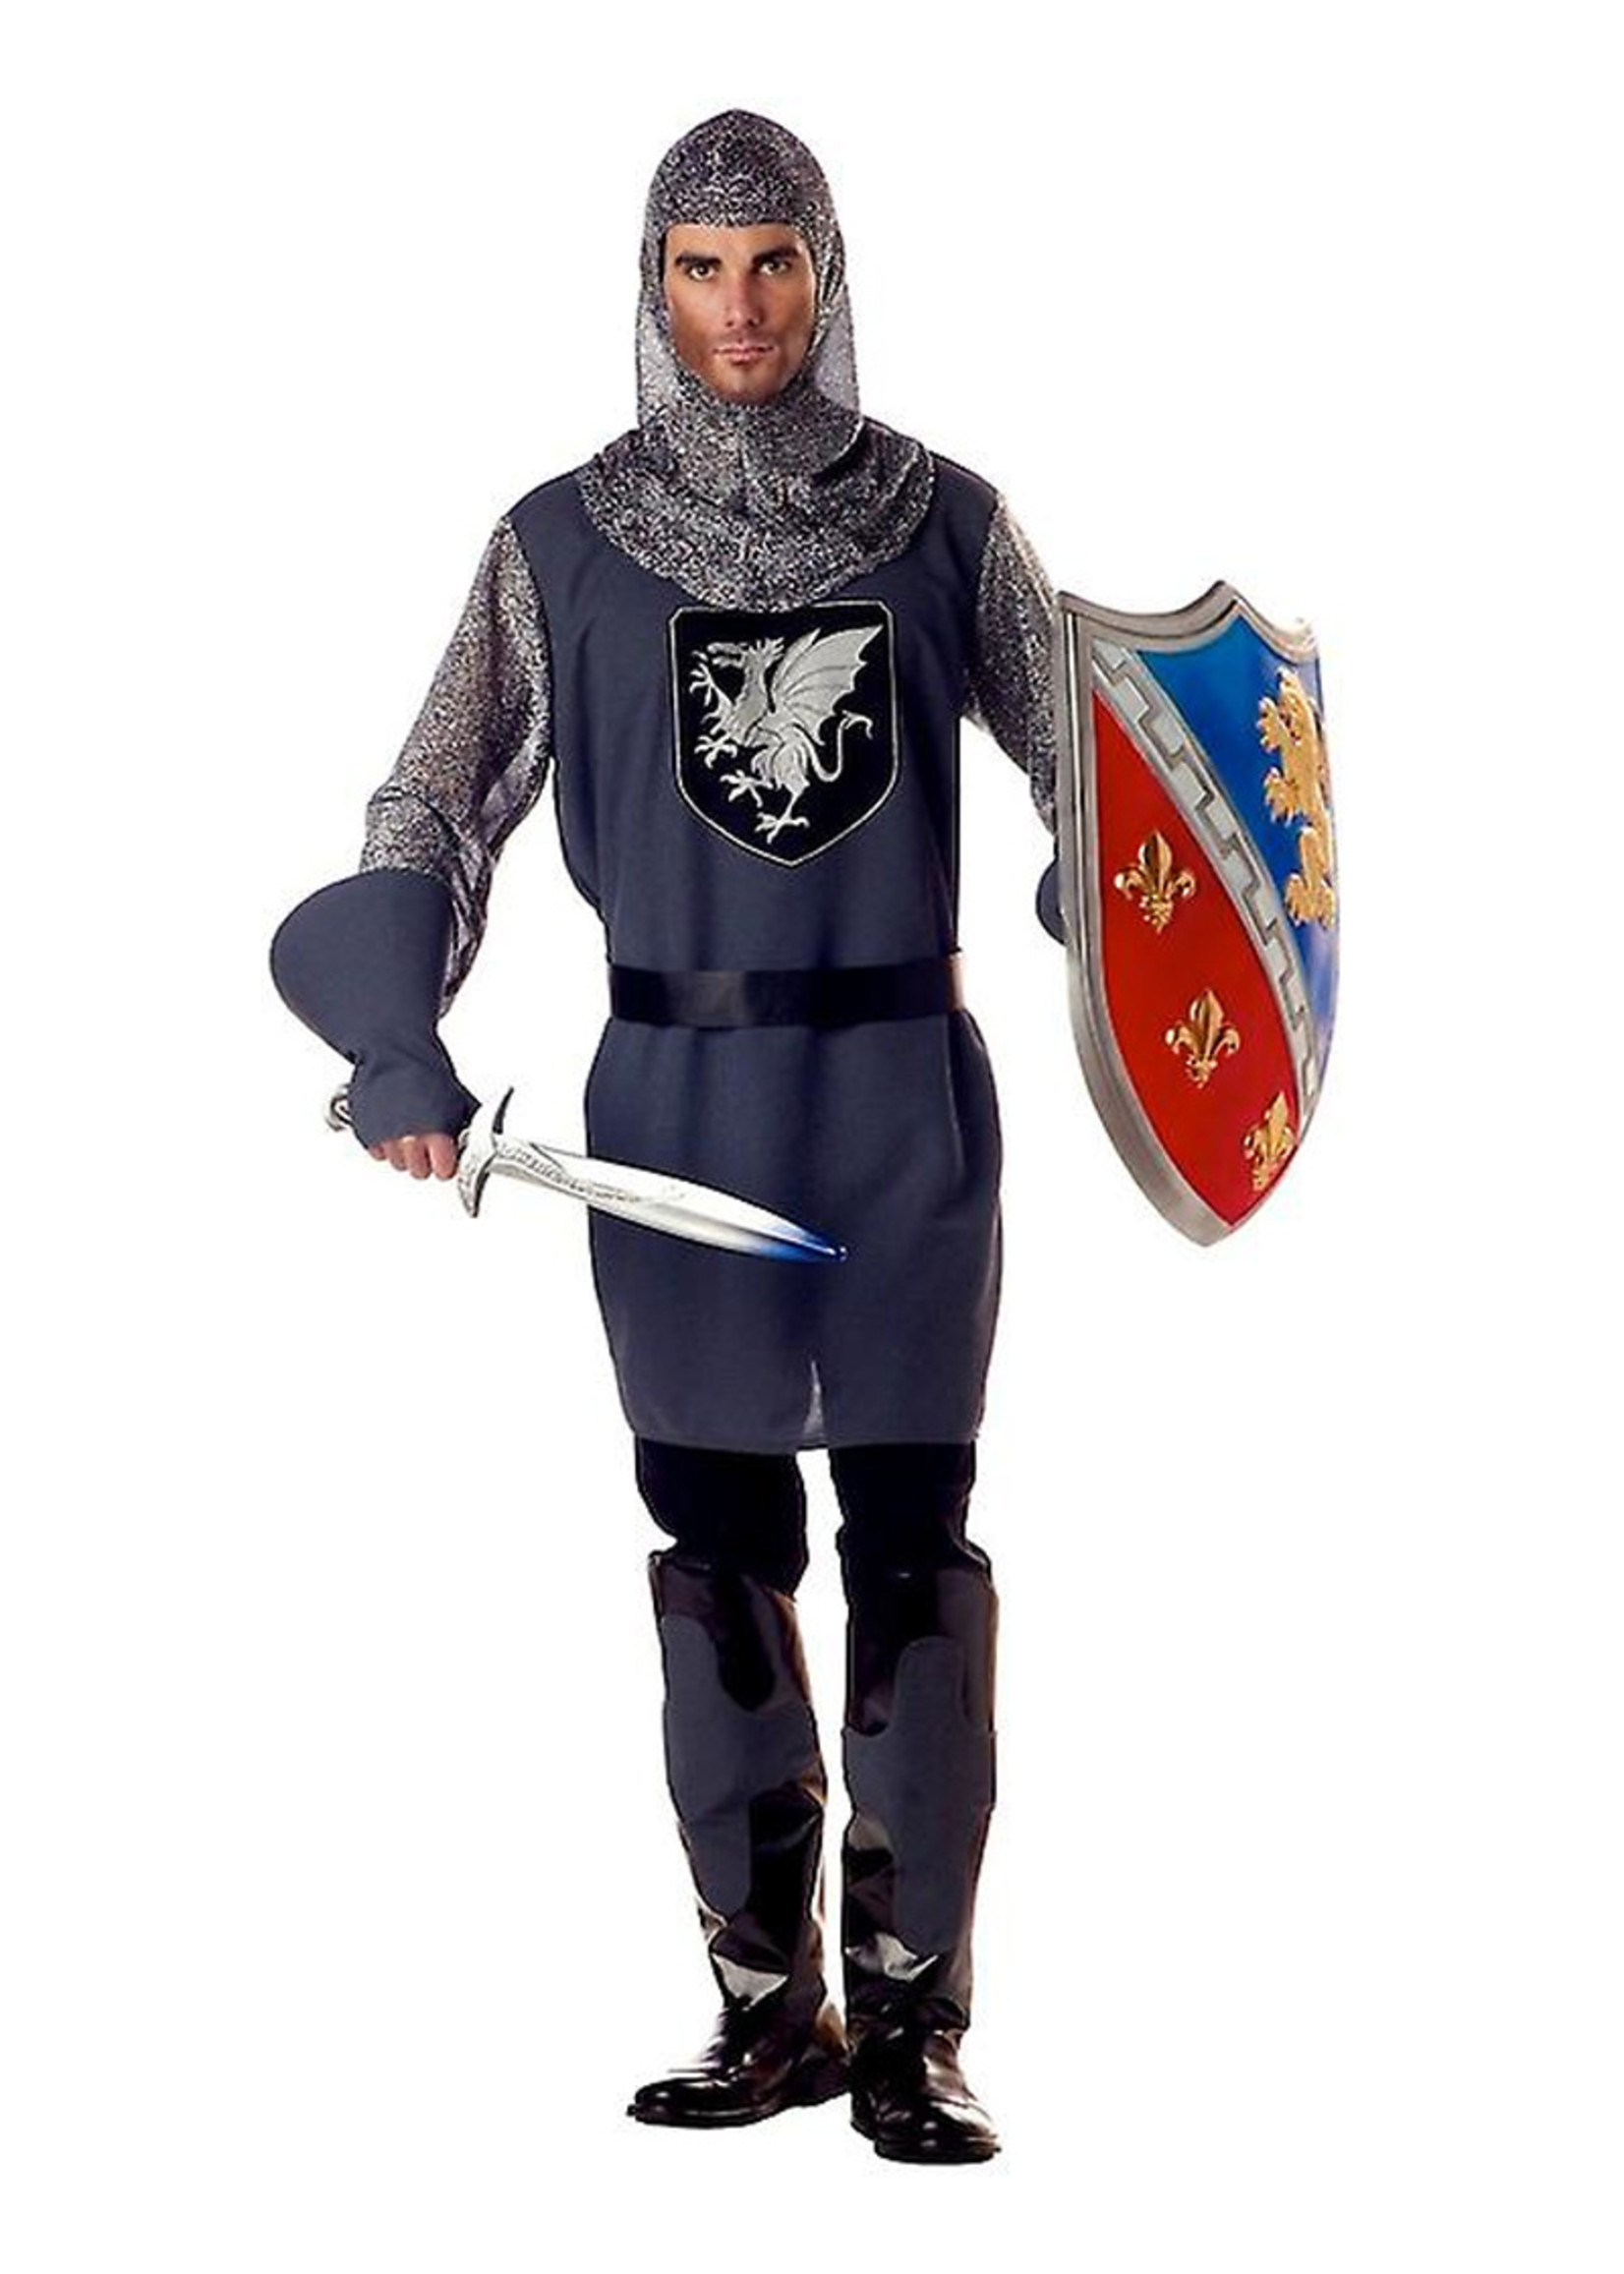 Valiant Knight Costume - Men's